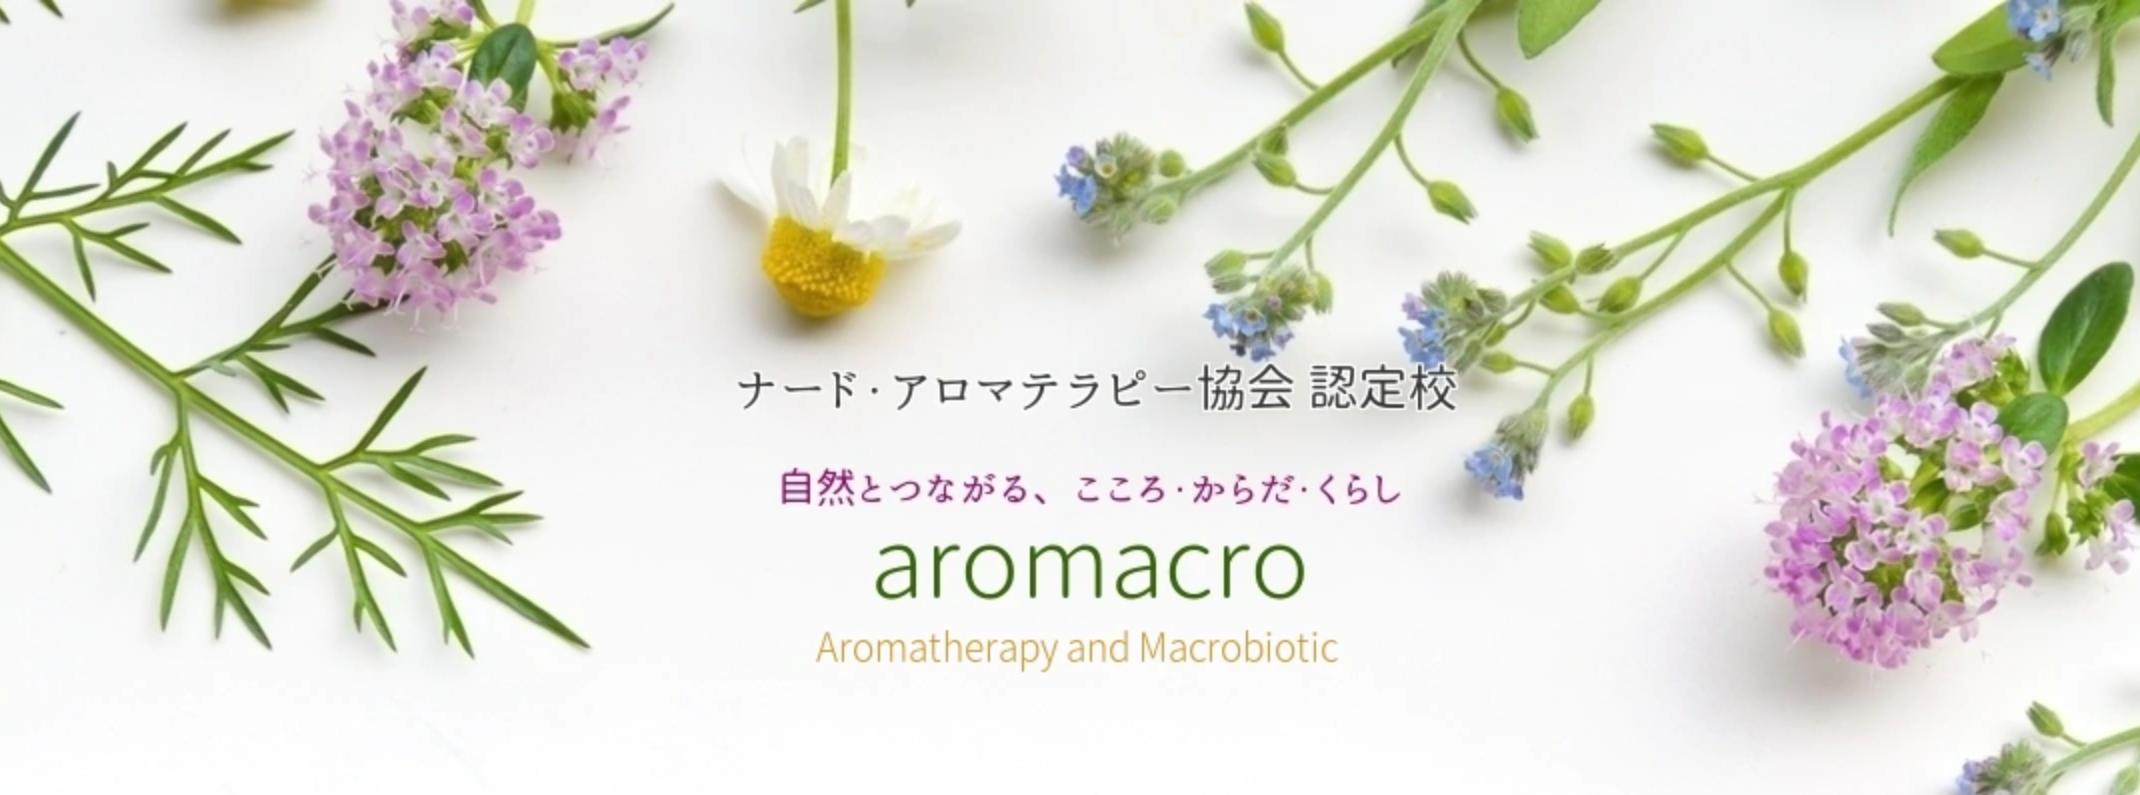 aromacro